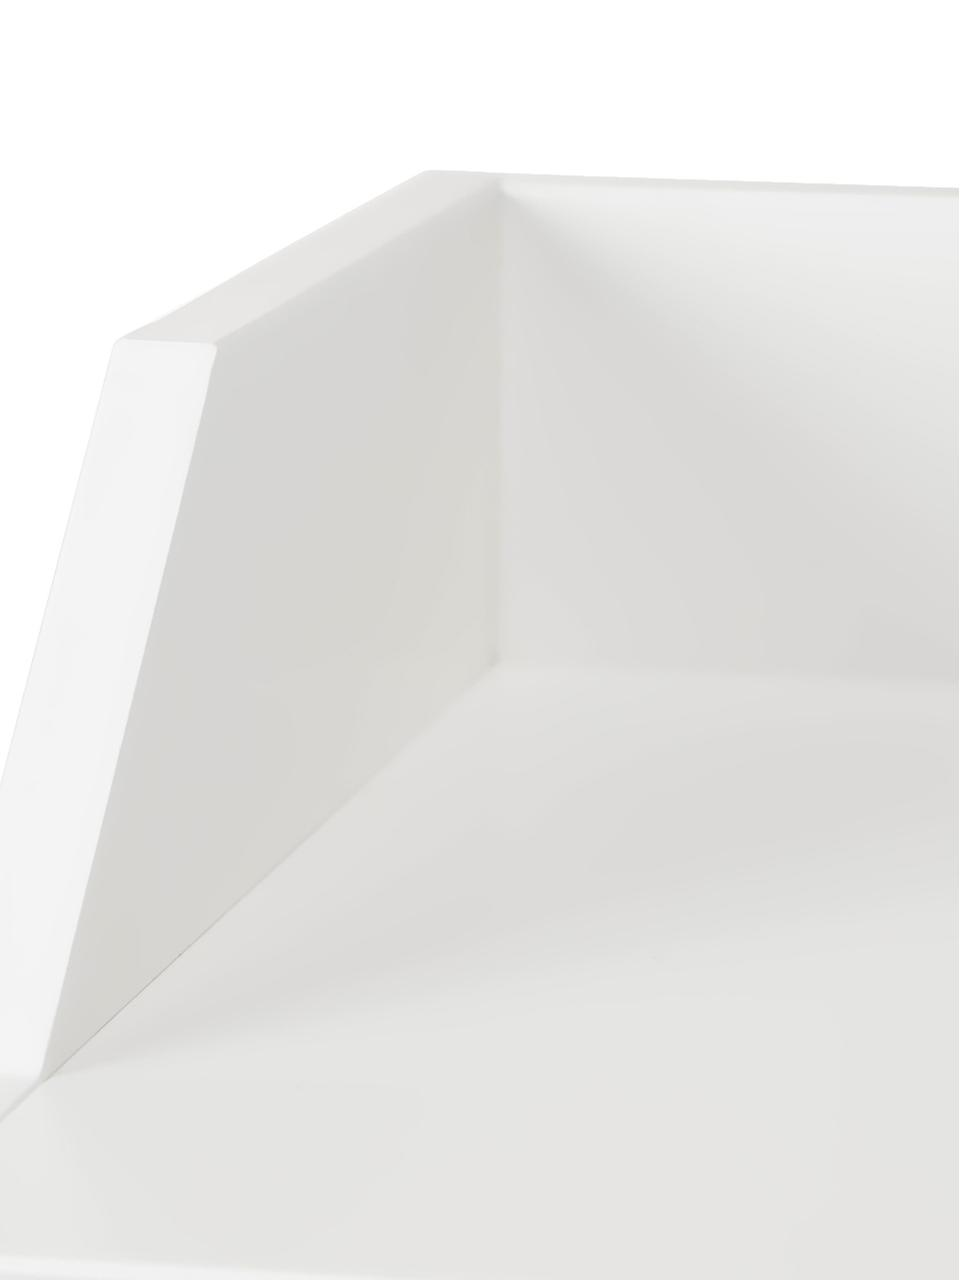 Wickelschrank Harlequin, Kiefernholz, lackiert, Weiß, 84 x 100 cm